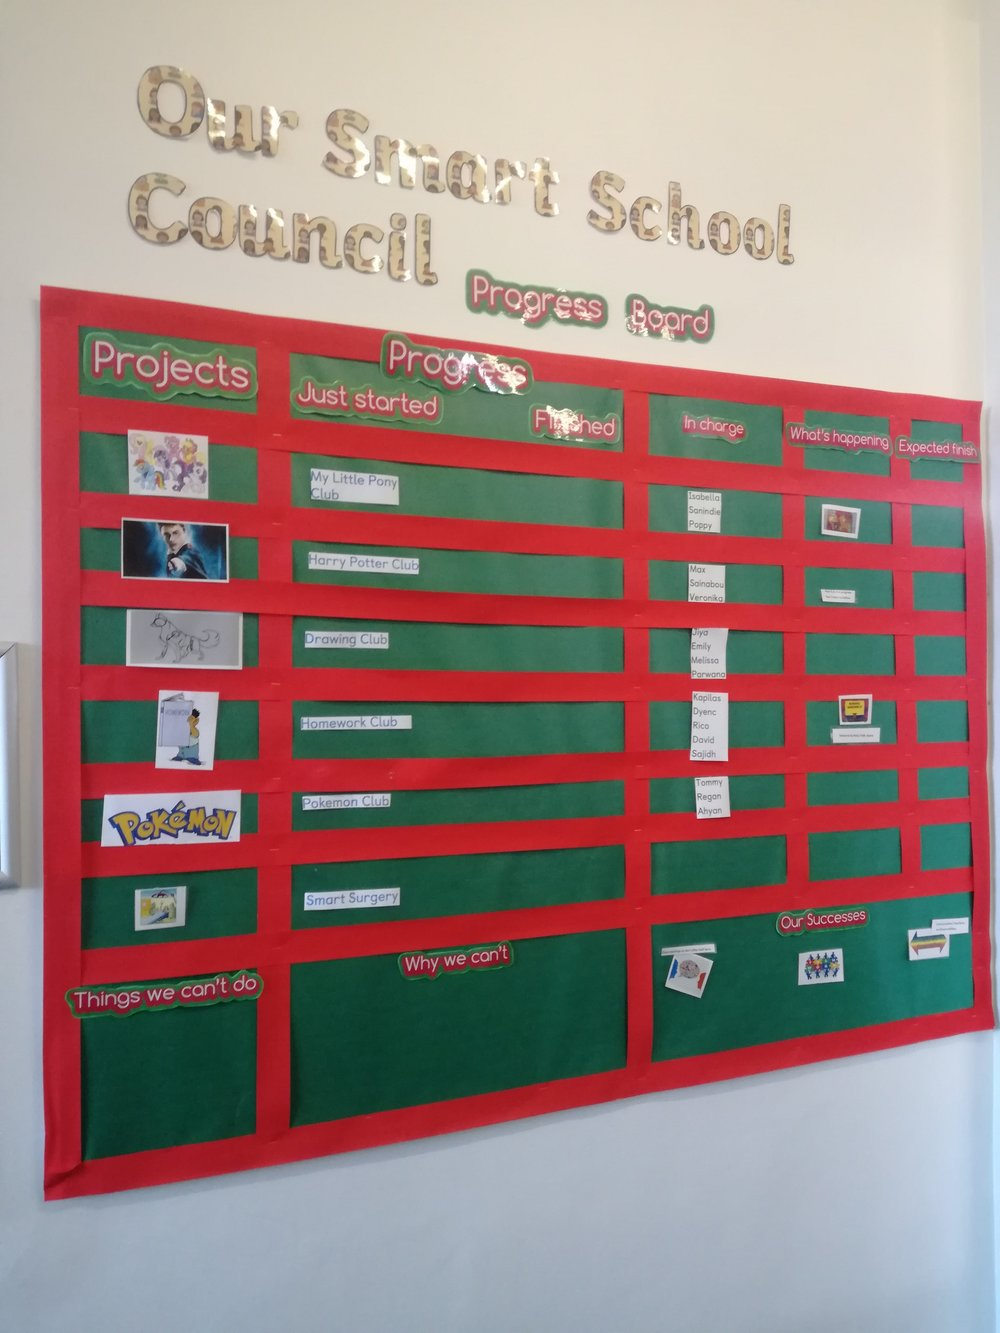 Progress board example 3 (1).jpg